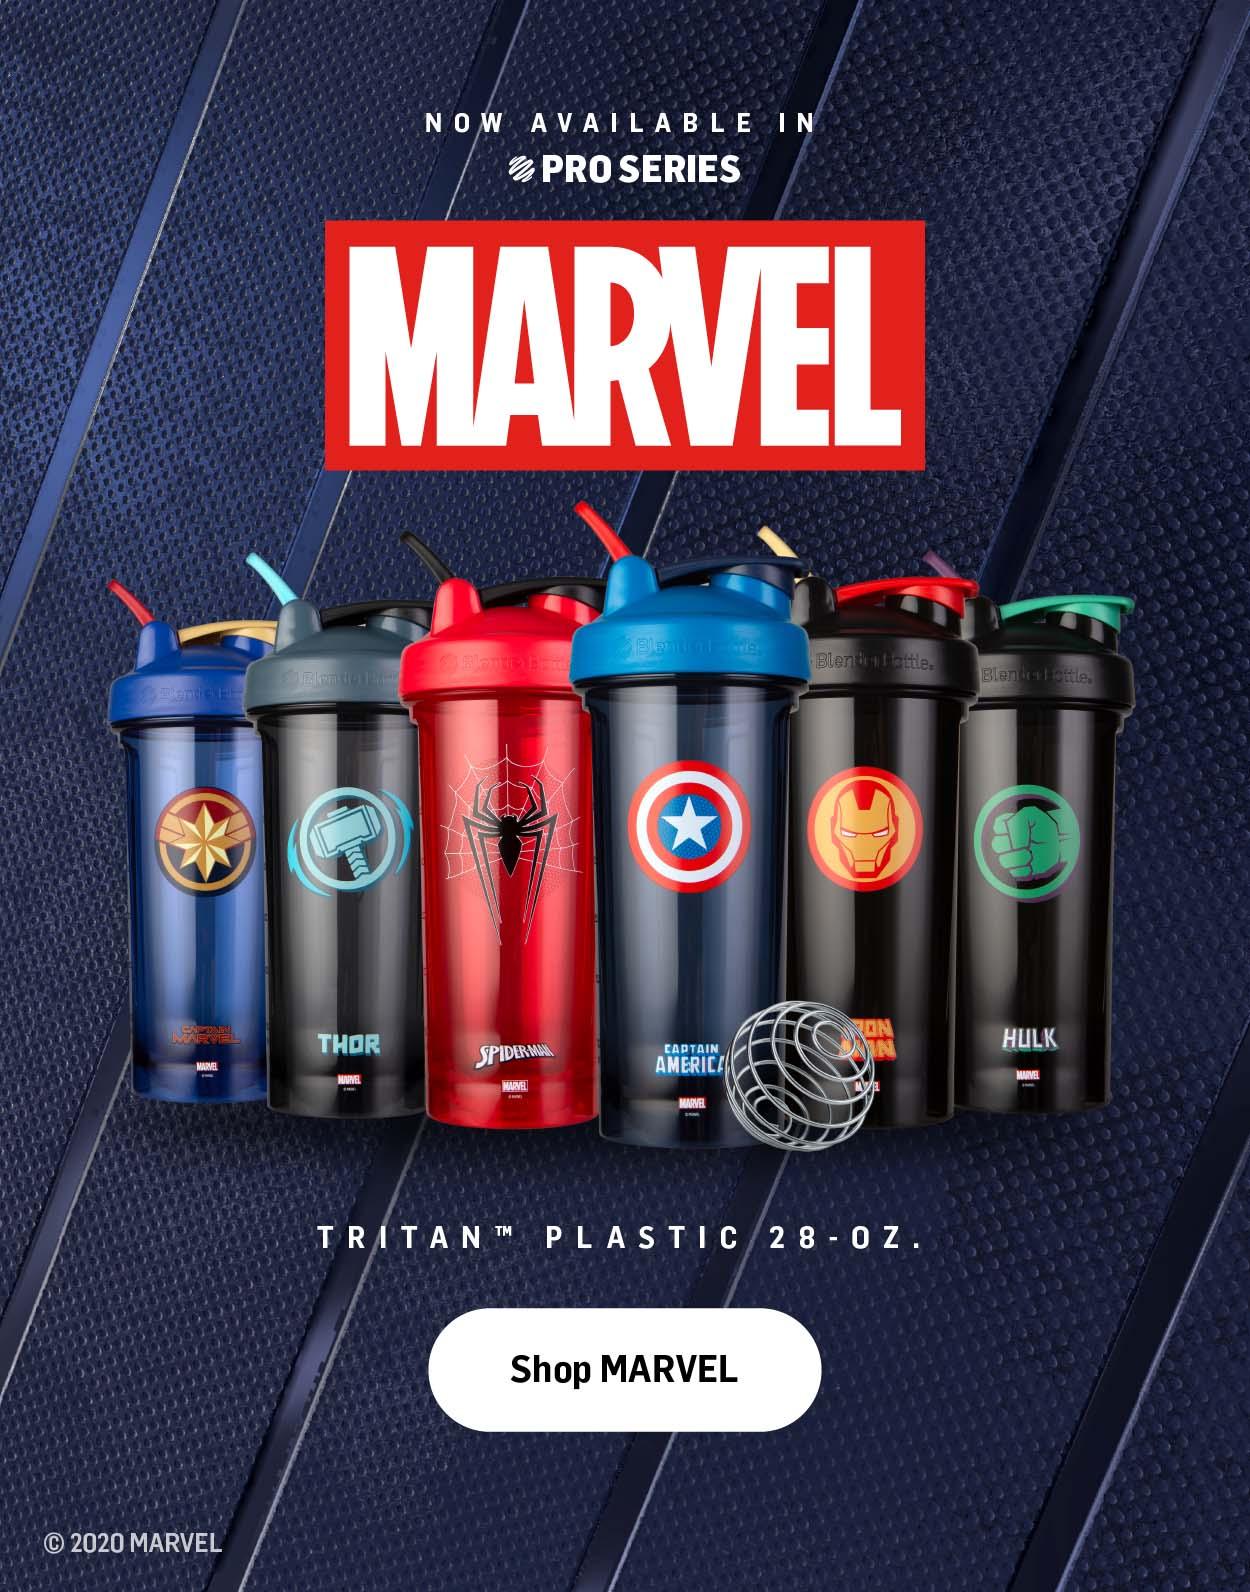 New! Marvel Pro Series Designs